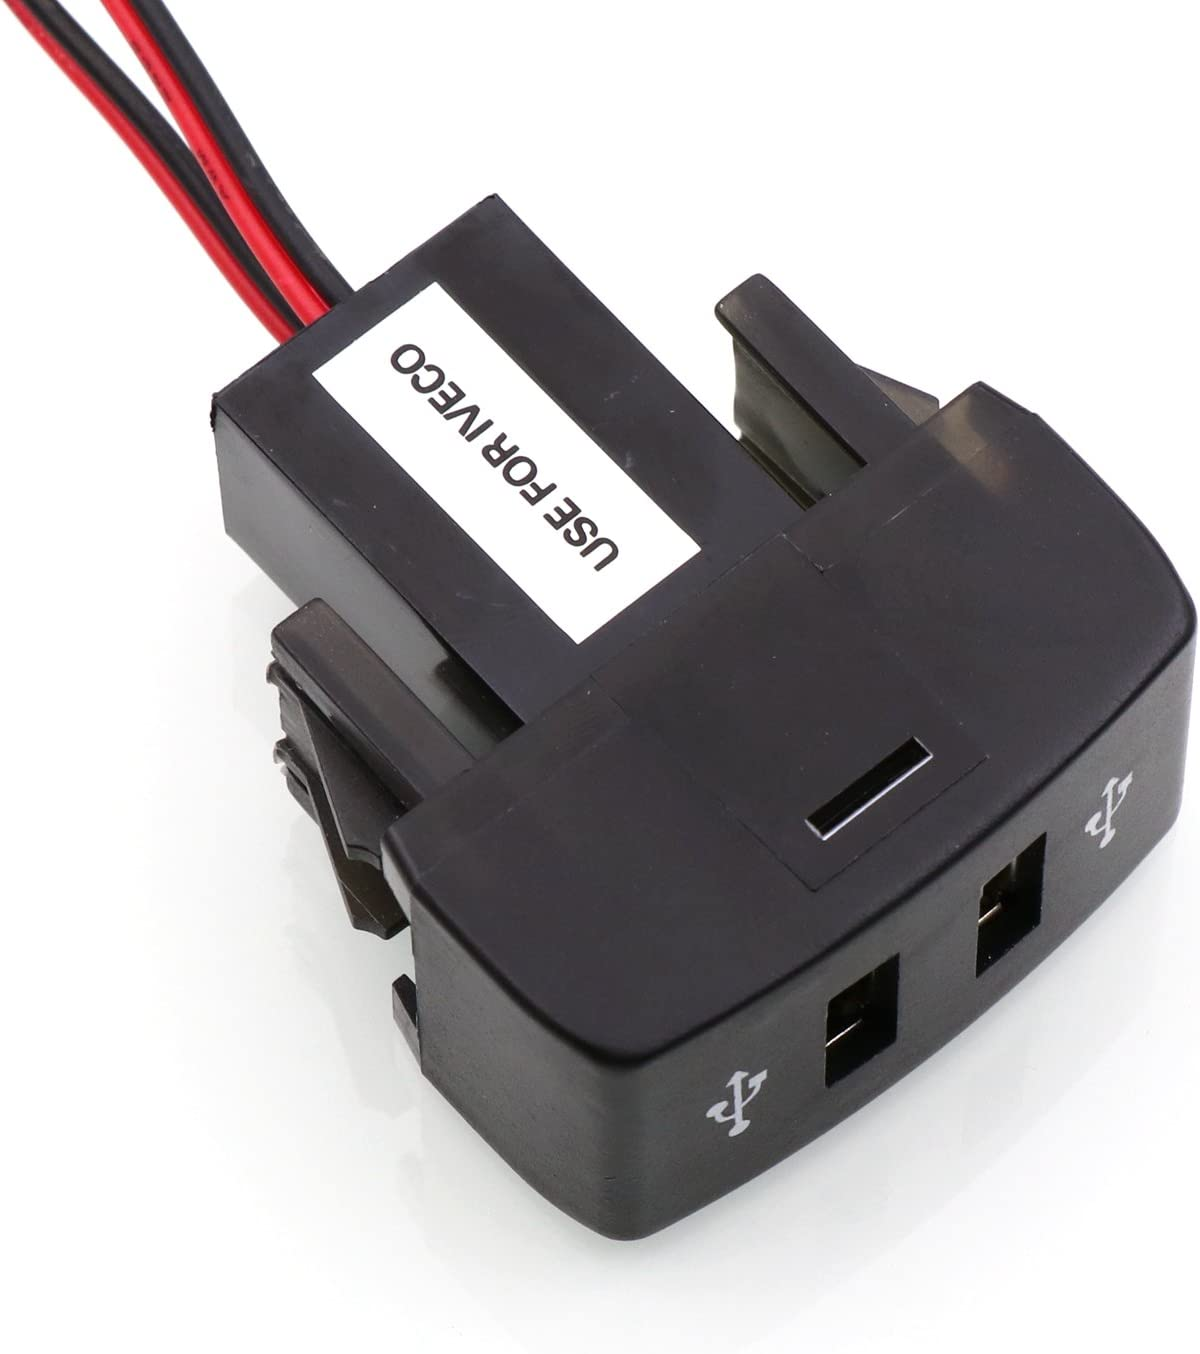 Timloon Dual Usb Ladegerät 5v 2 1a Elektronik